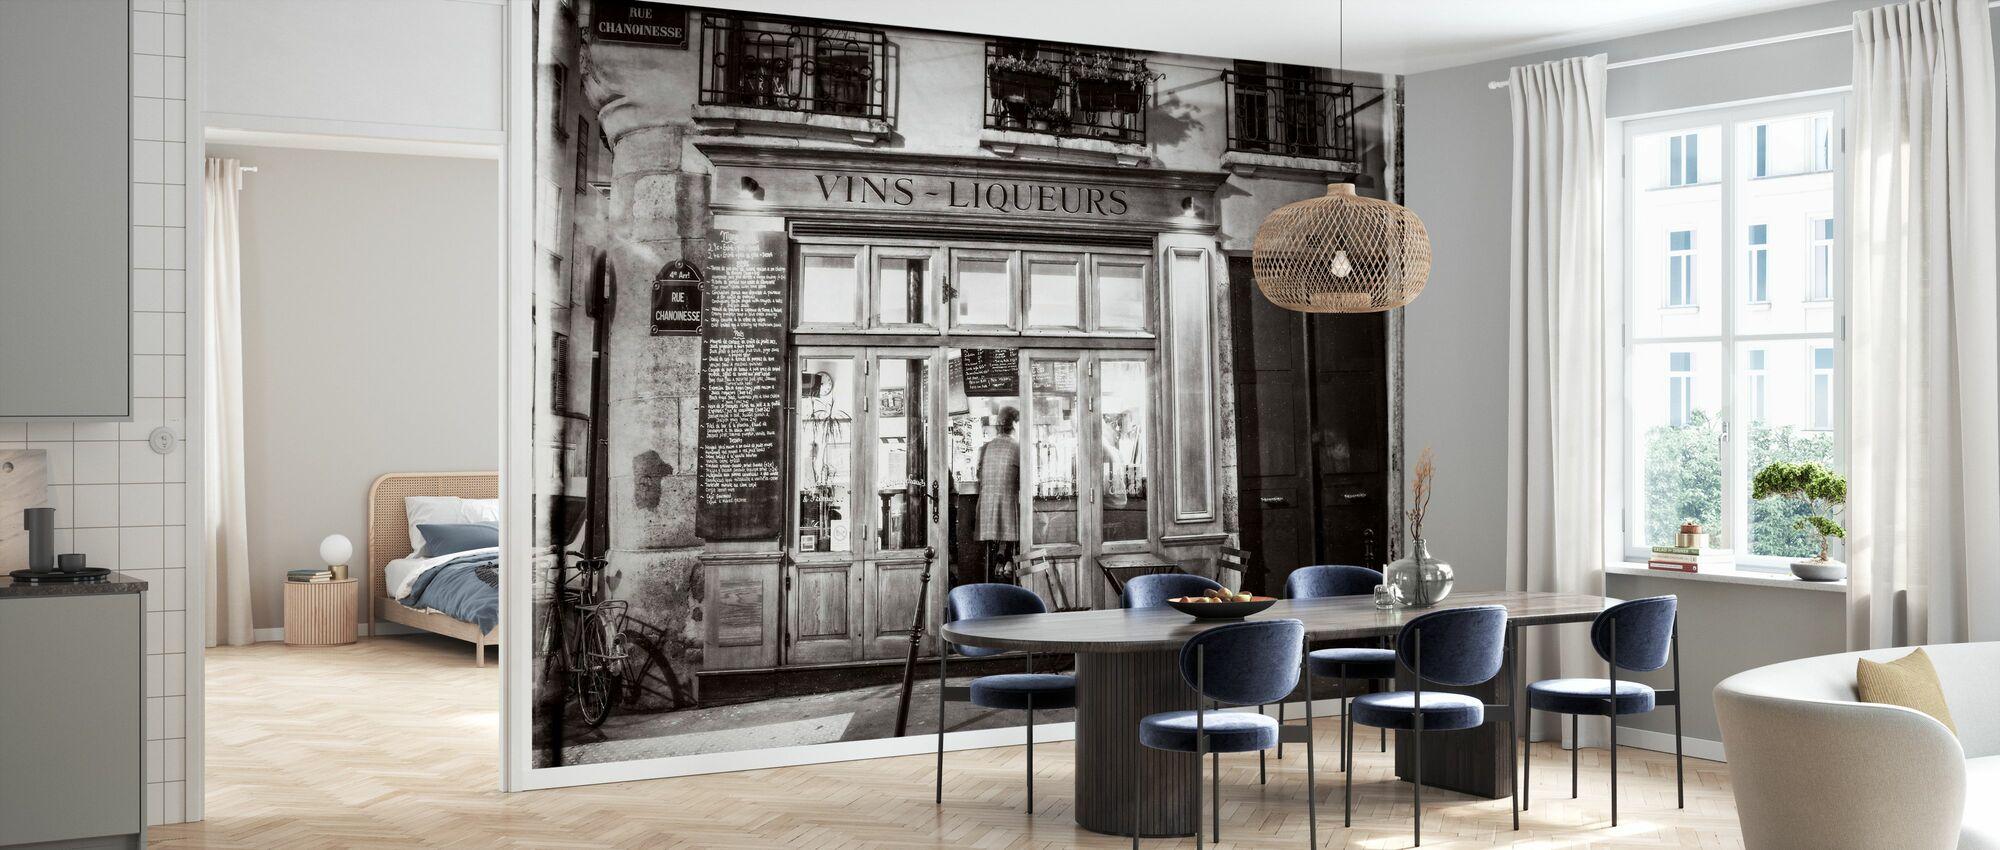 Liquor Store - Paris - Wallpaper - Kitchen